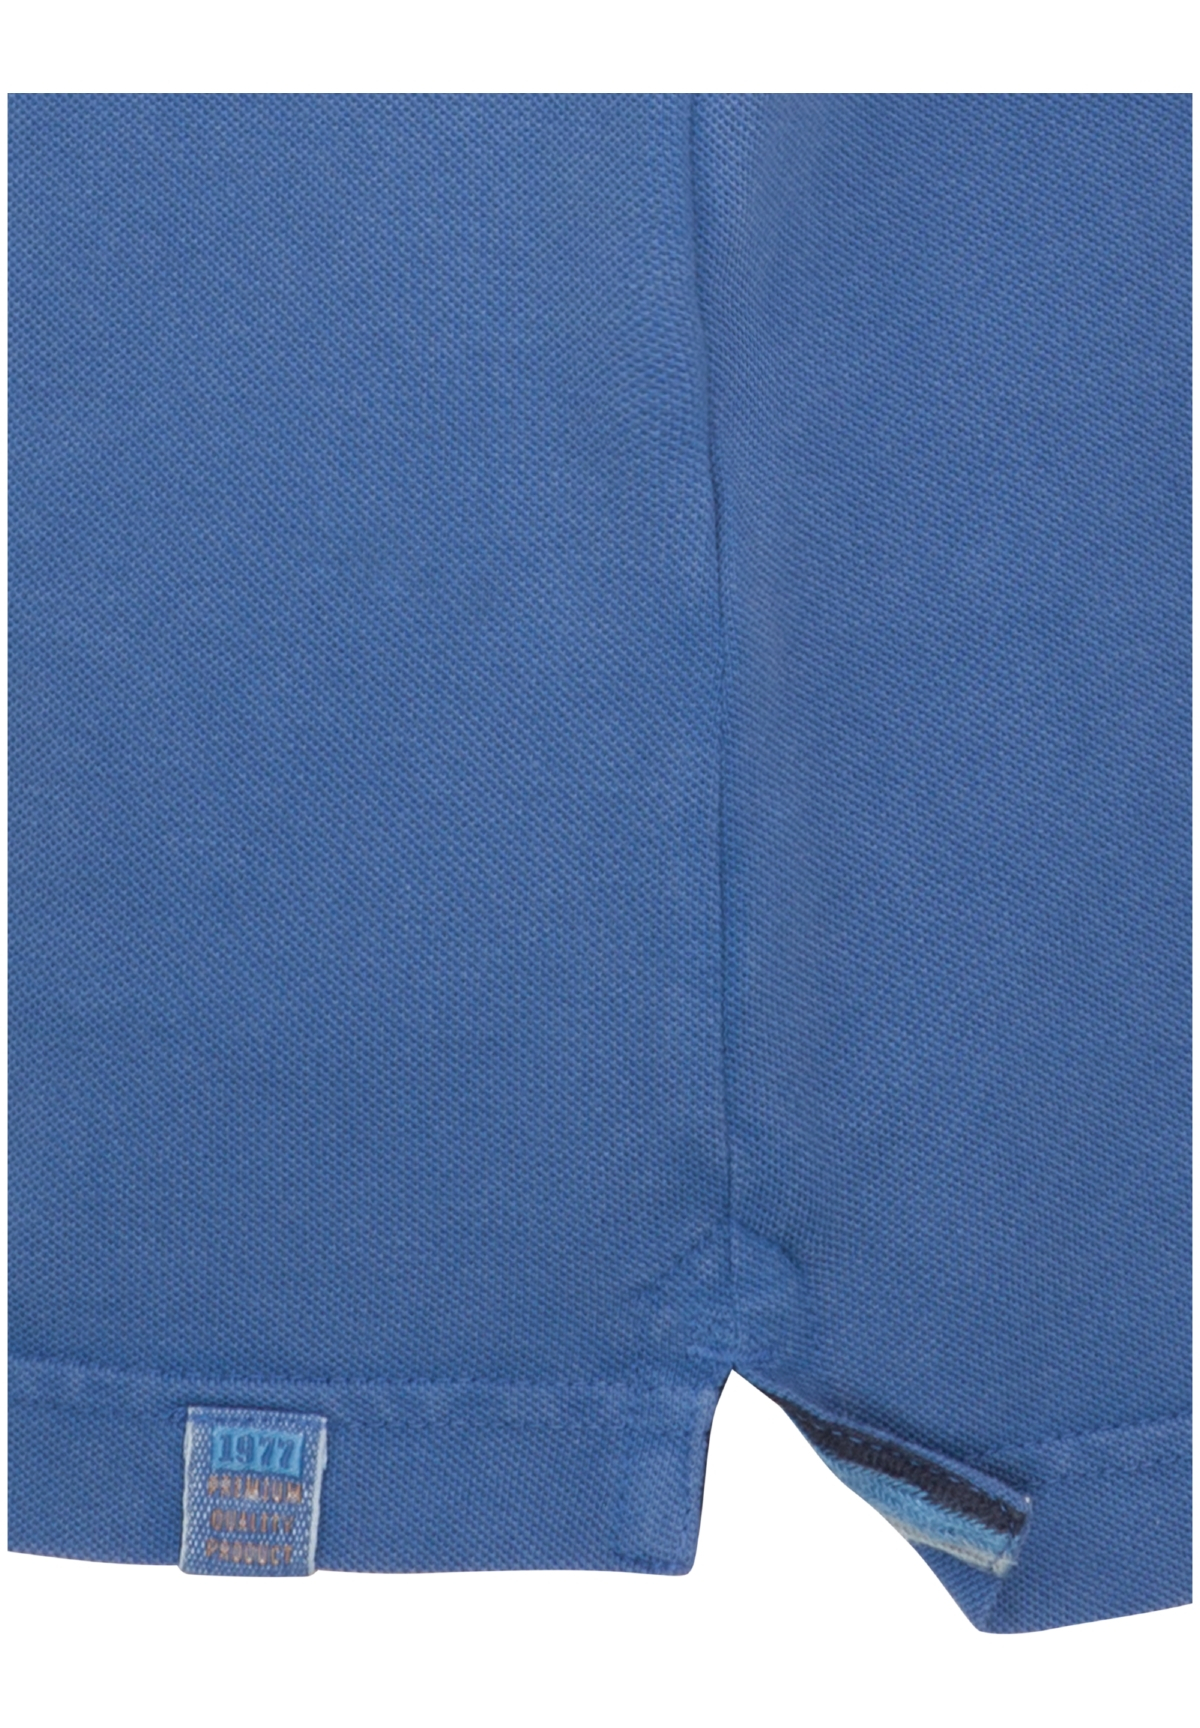 Camel-Active-Herren-Shirt-Poloshirt-Pique-Regular-Fit-NEU Indexbild 19